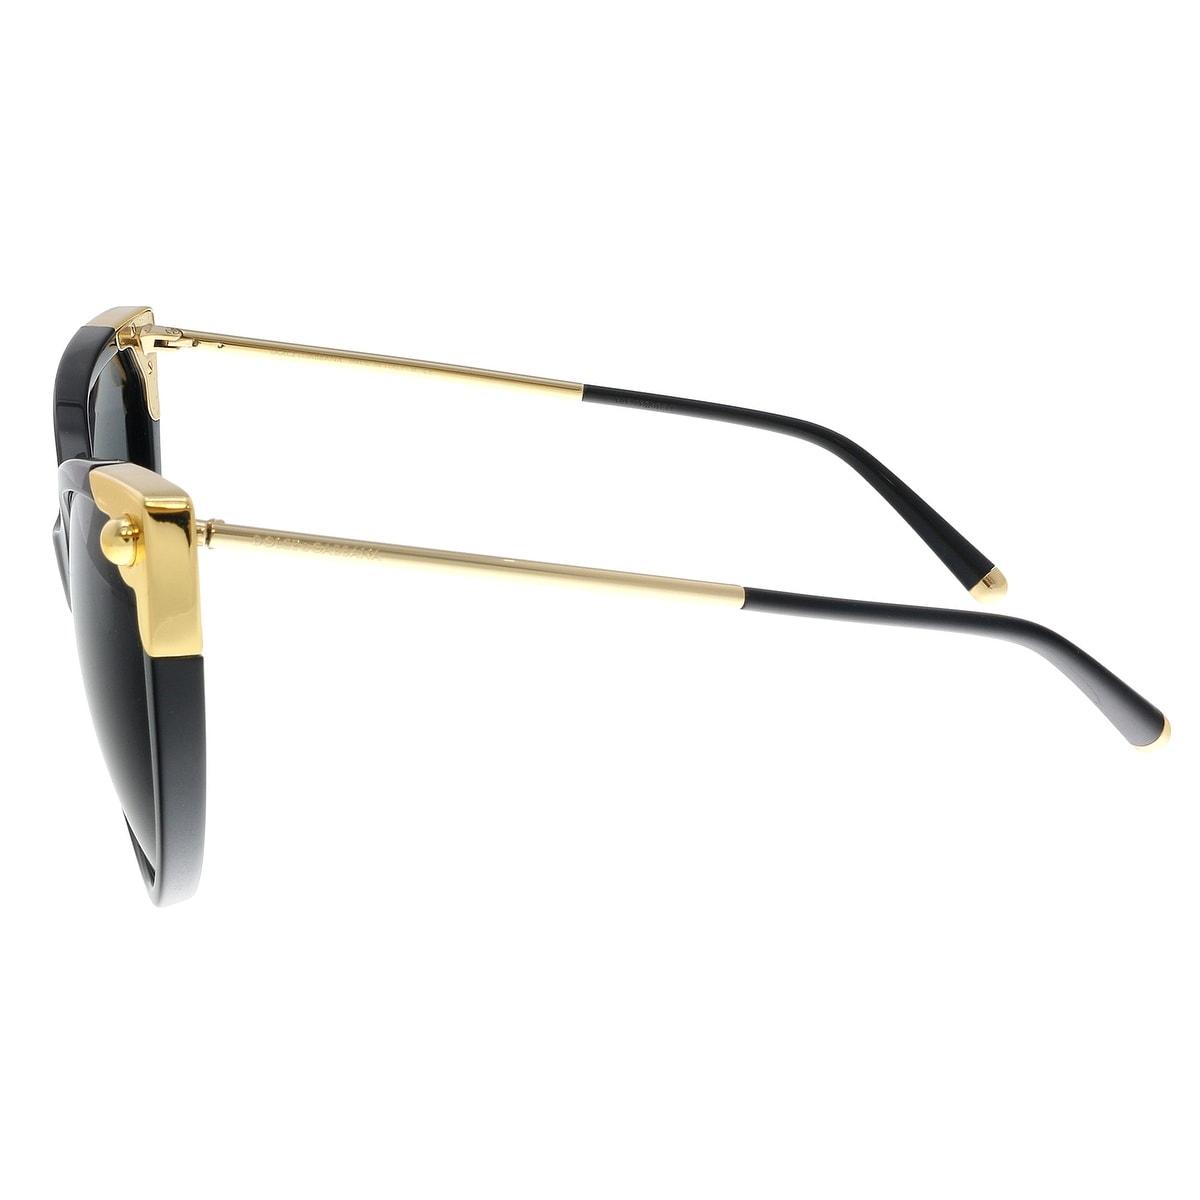 14b4fe2c625 Shop Dolce   Gabbana DG4337 501 87 Black Cat Eye Sunglasses - No Size -  Free Shipping Today - Overstock - 23595805